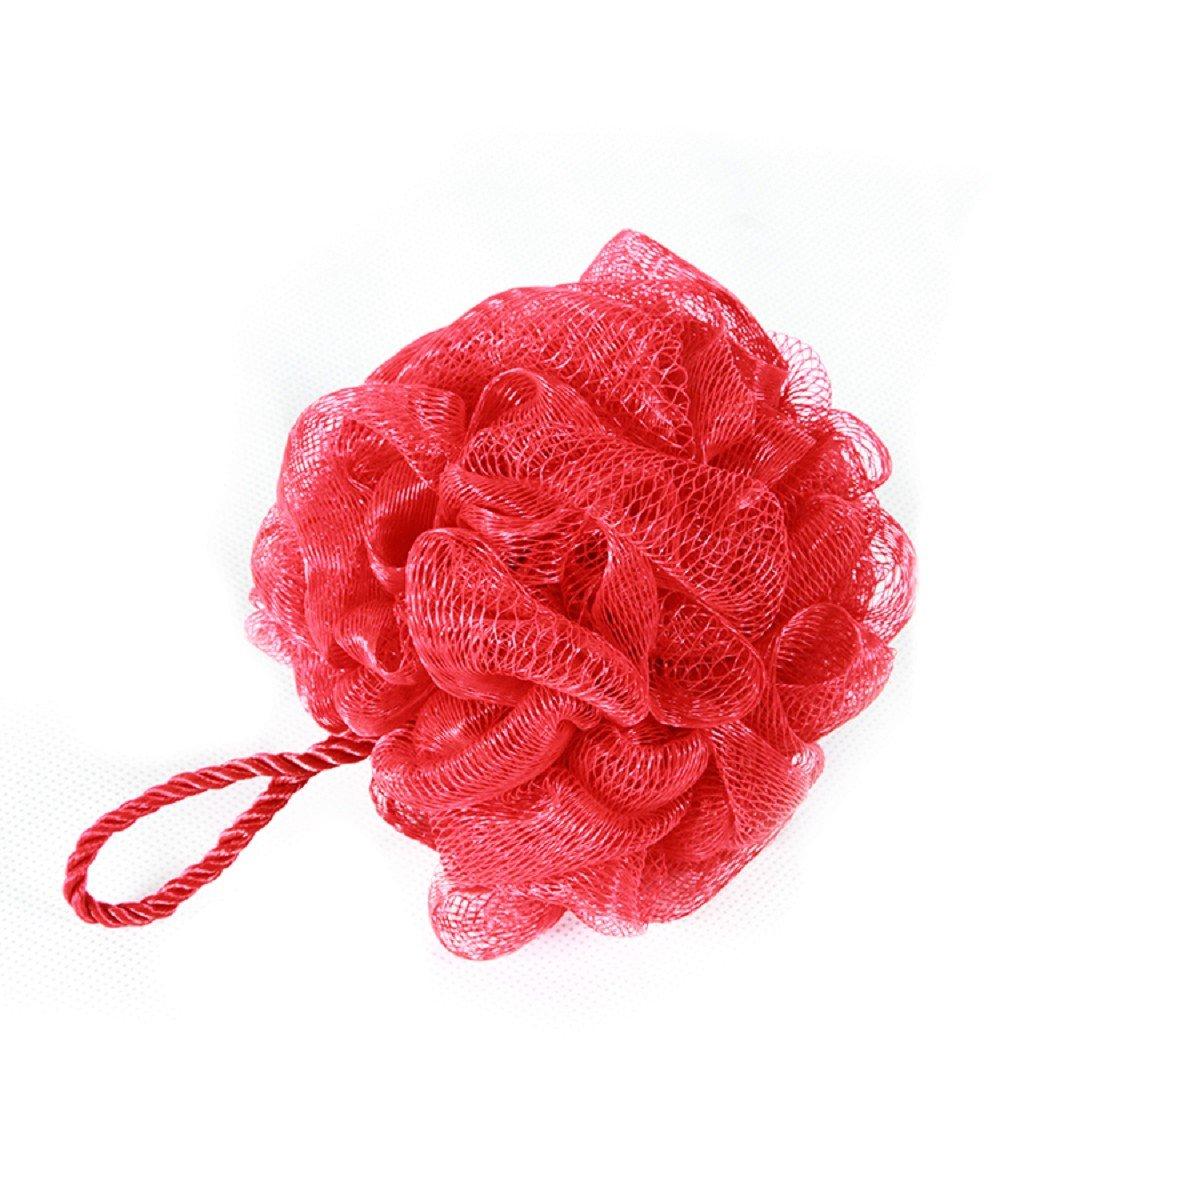 Carpe modo spugna da bagno doccia spugna einseifschwamm in plastica, colore: rosso, 1pezzi Carpemodo